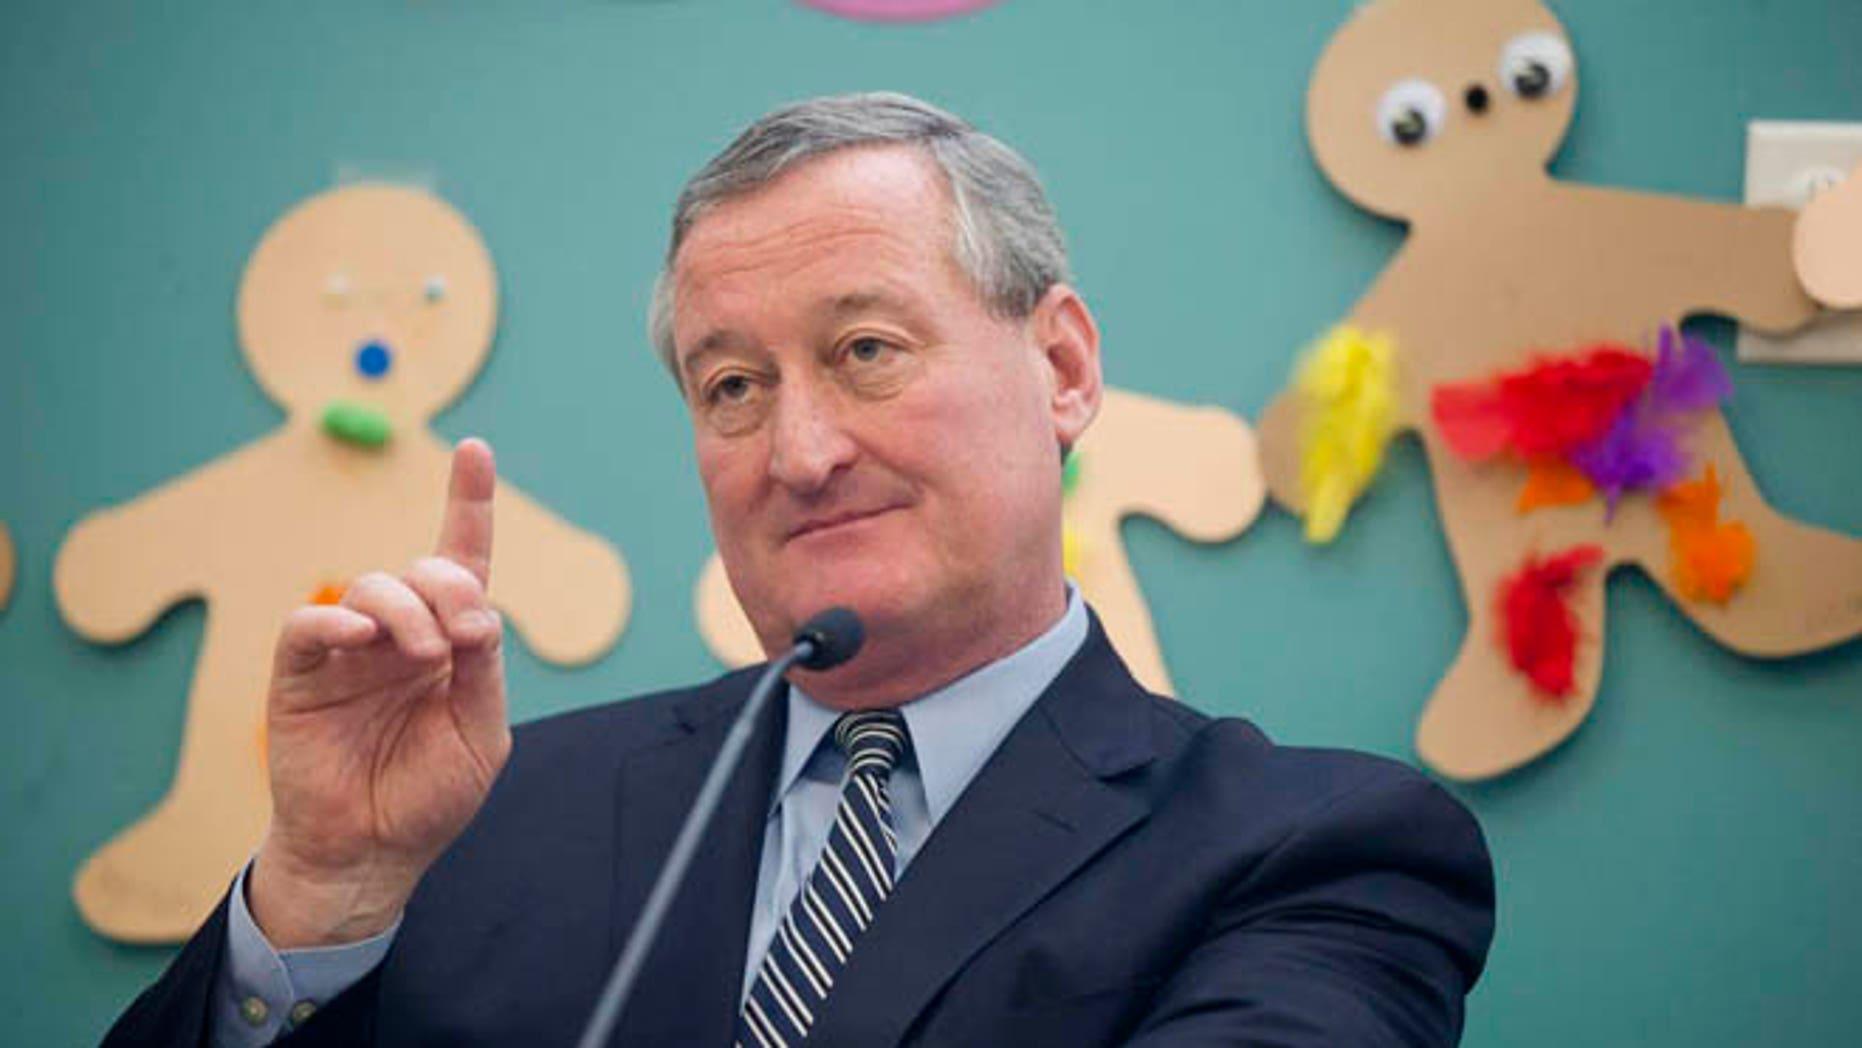 Philadelphia Mayor James Kenney (D) is shown in this AP photo. (Matt Rourke/Associated Press)